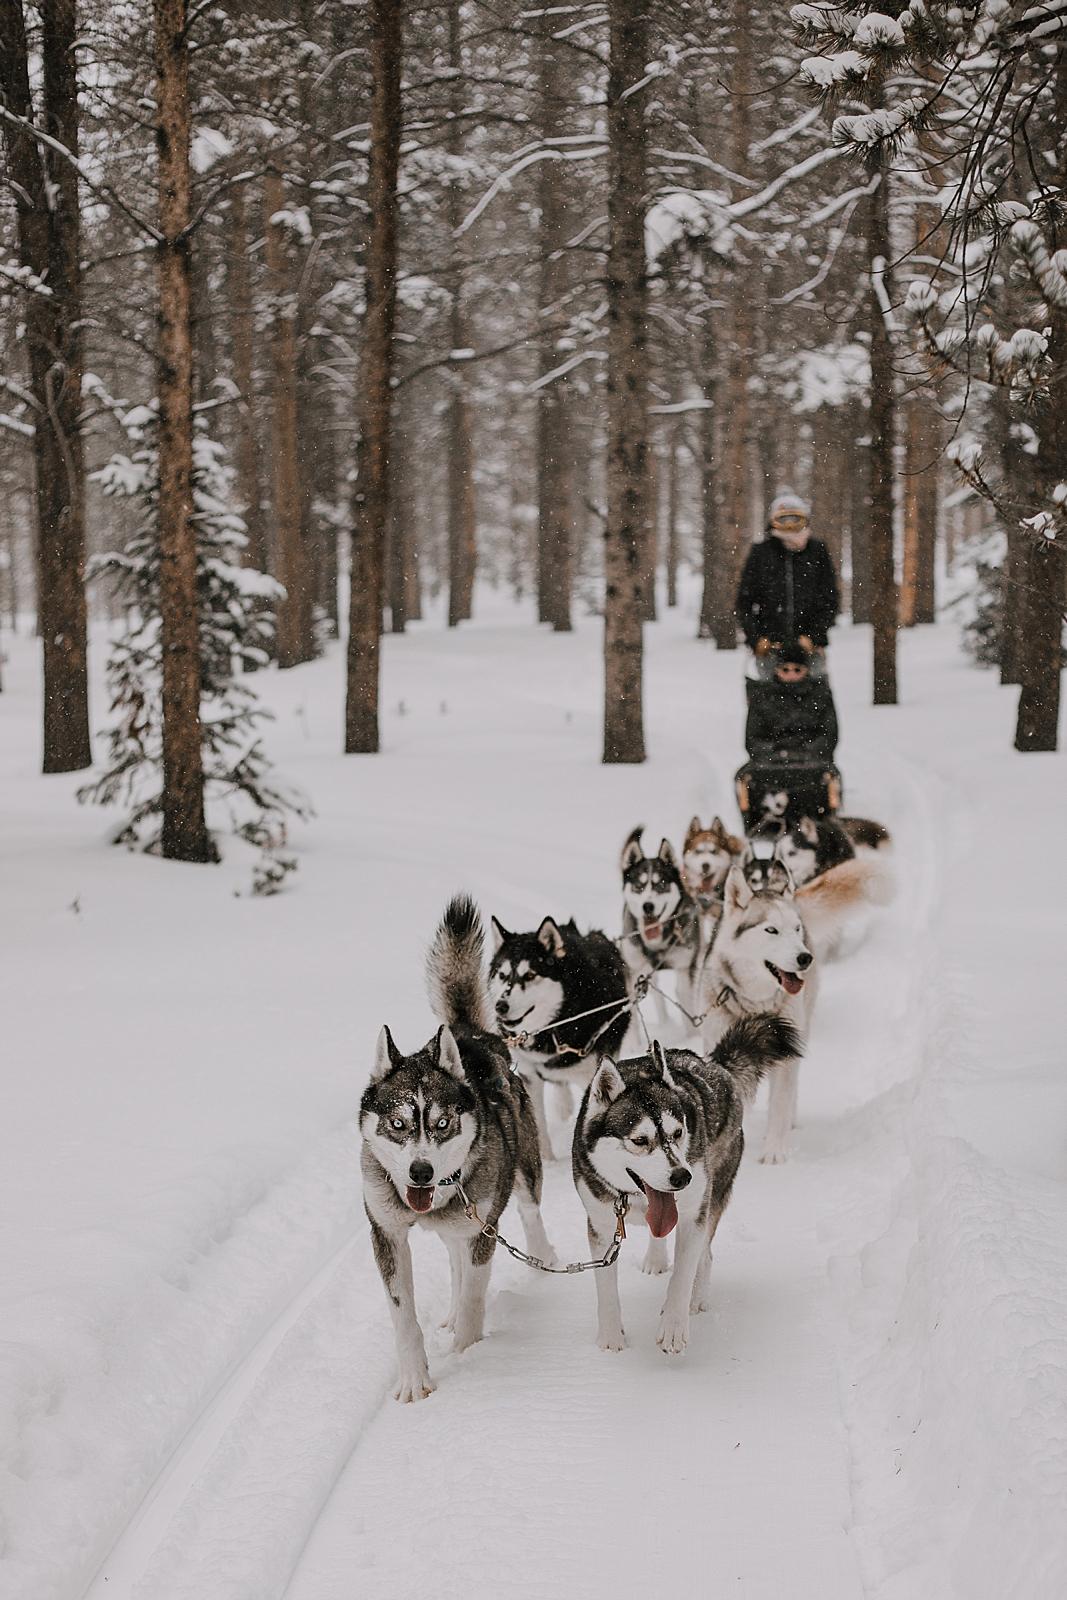 dogsledding engagement, sled dog, dogsledding, winter, winter elopement, winter wedding, breckenridge colorado photographer, colorado dog sledding, alaska, dogsledding elopement